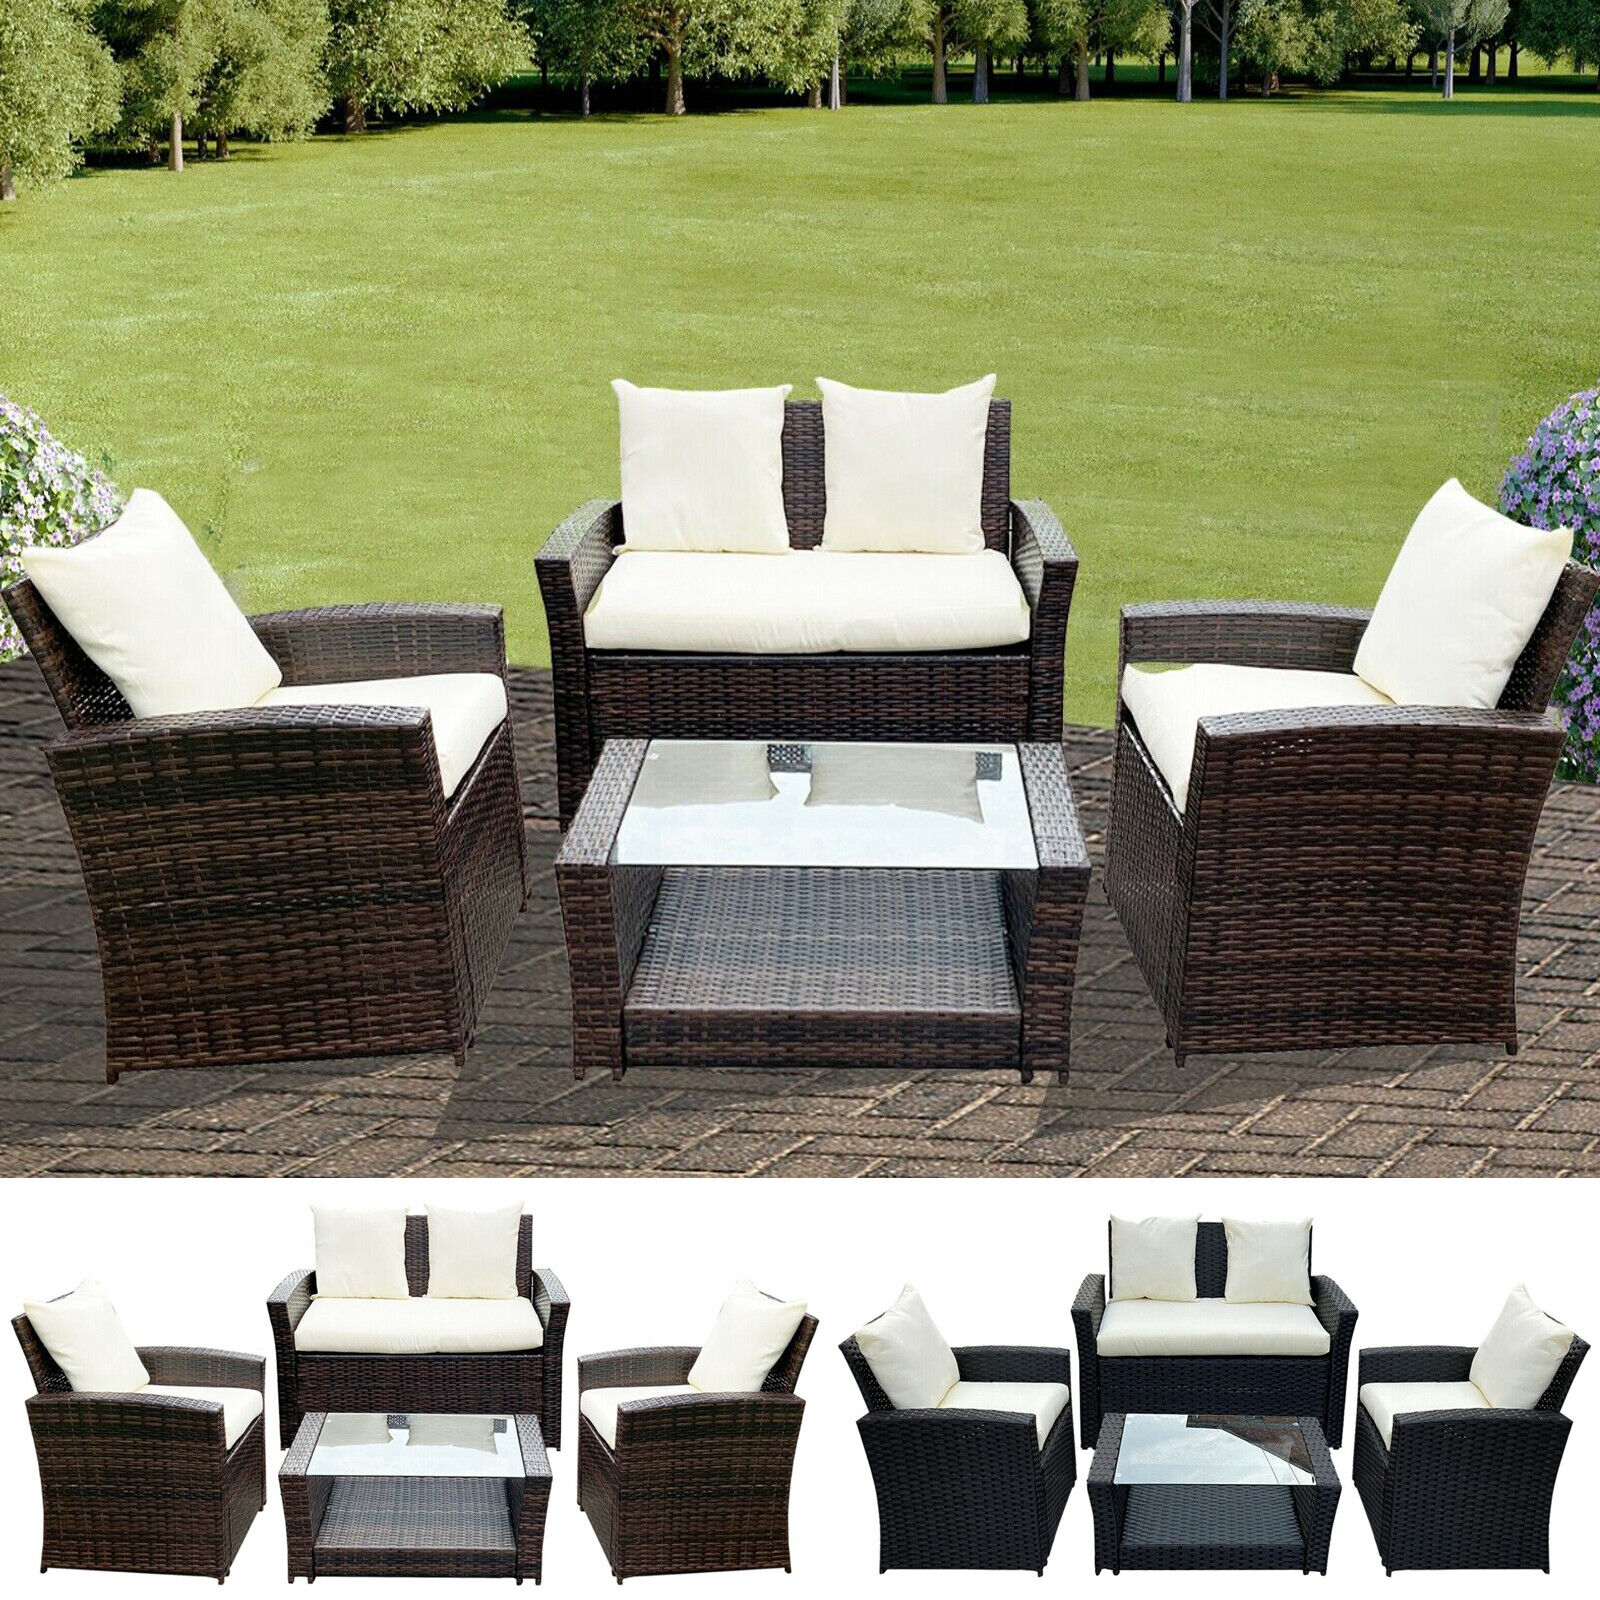 Garden Furniture - Rattan Garden Furniture Conservatory Sofa Set 4 Seat Table Chair Armchairs Patio